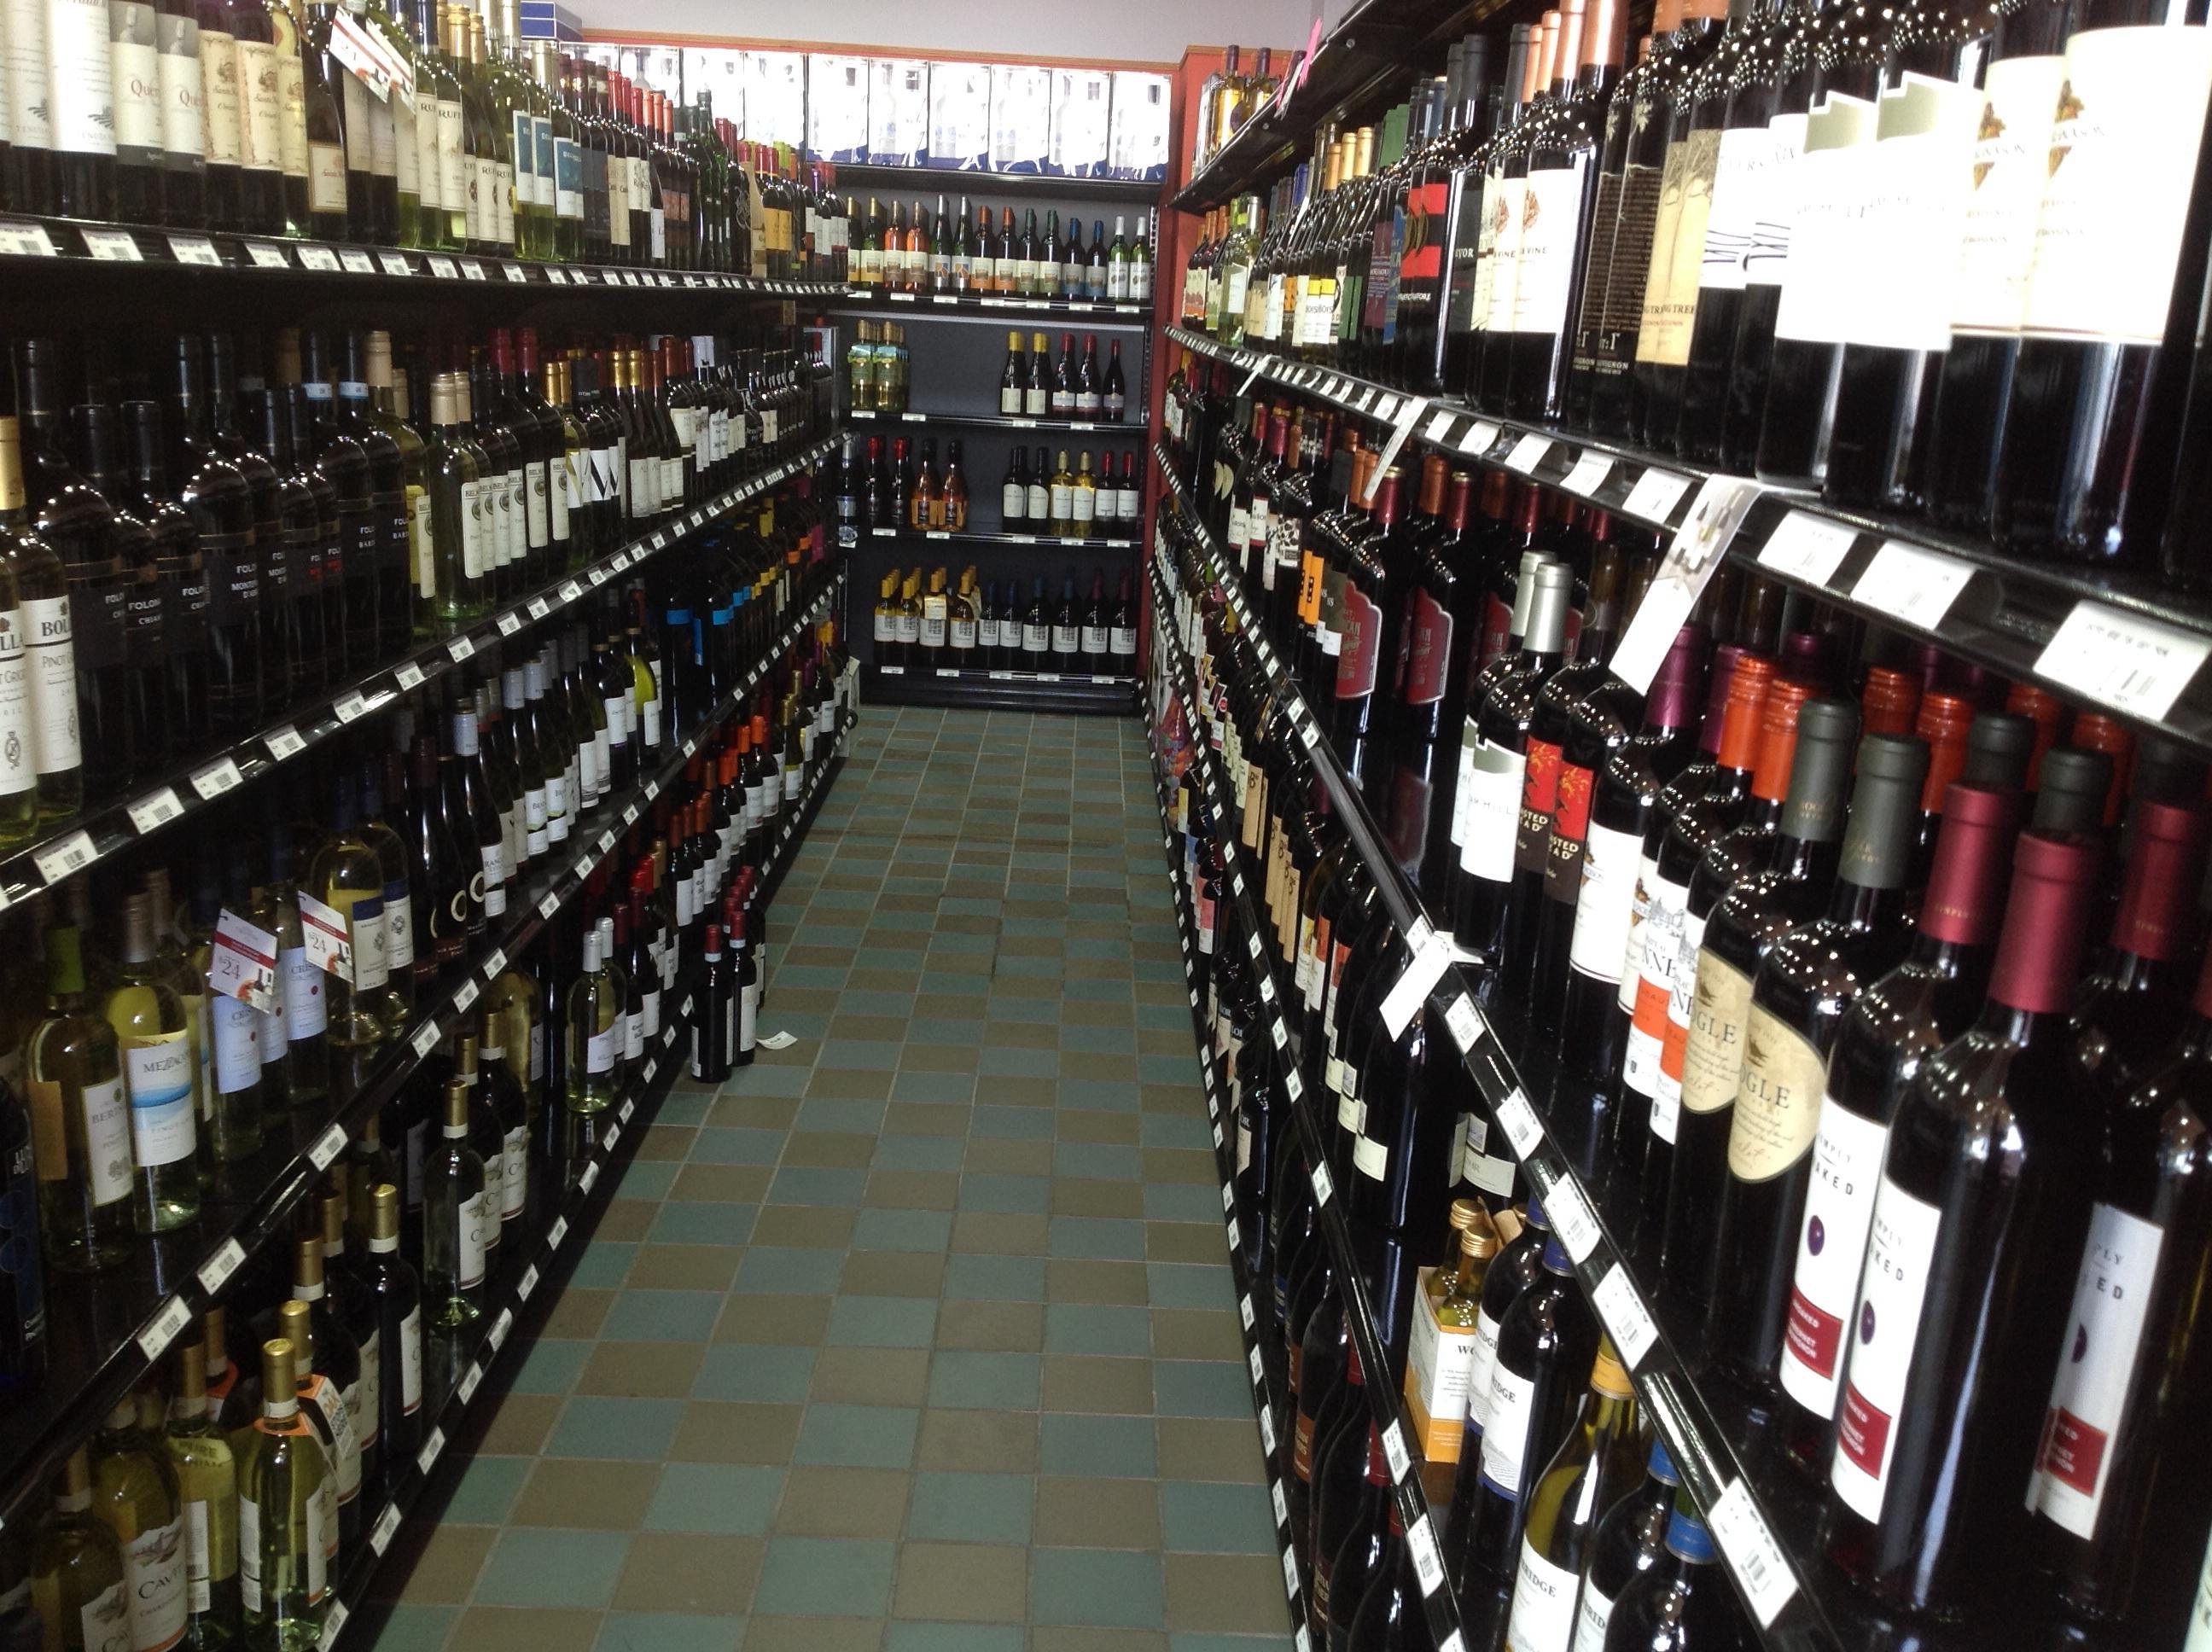 Wantagh Wine & Liquor image 1